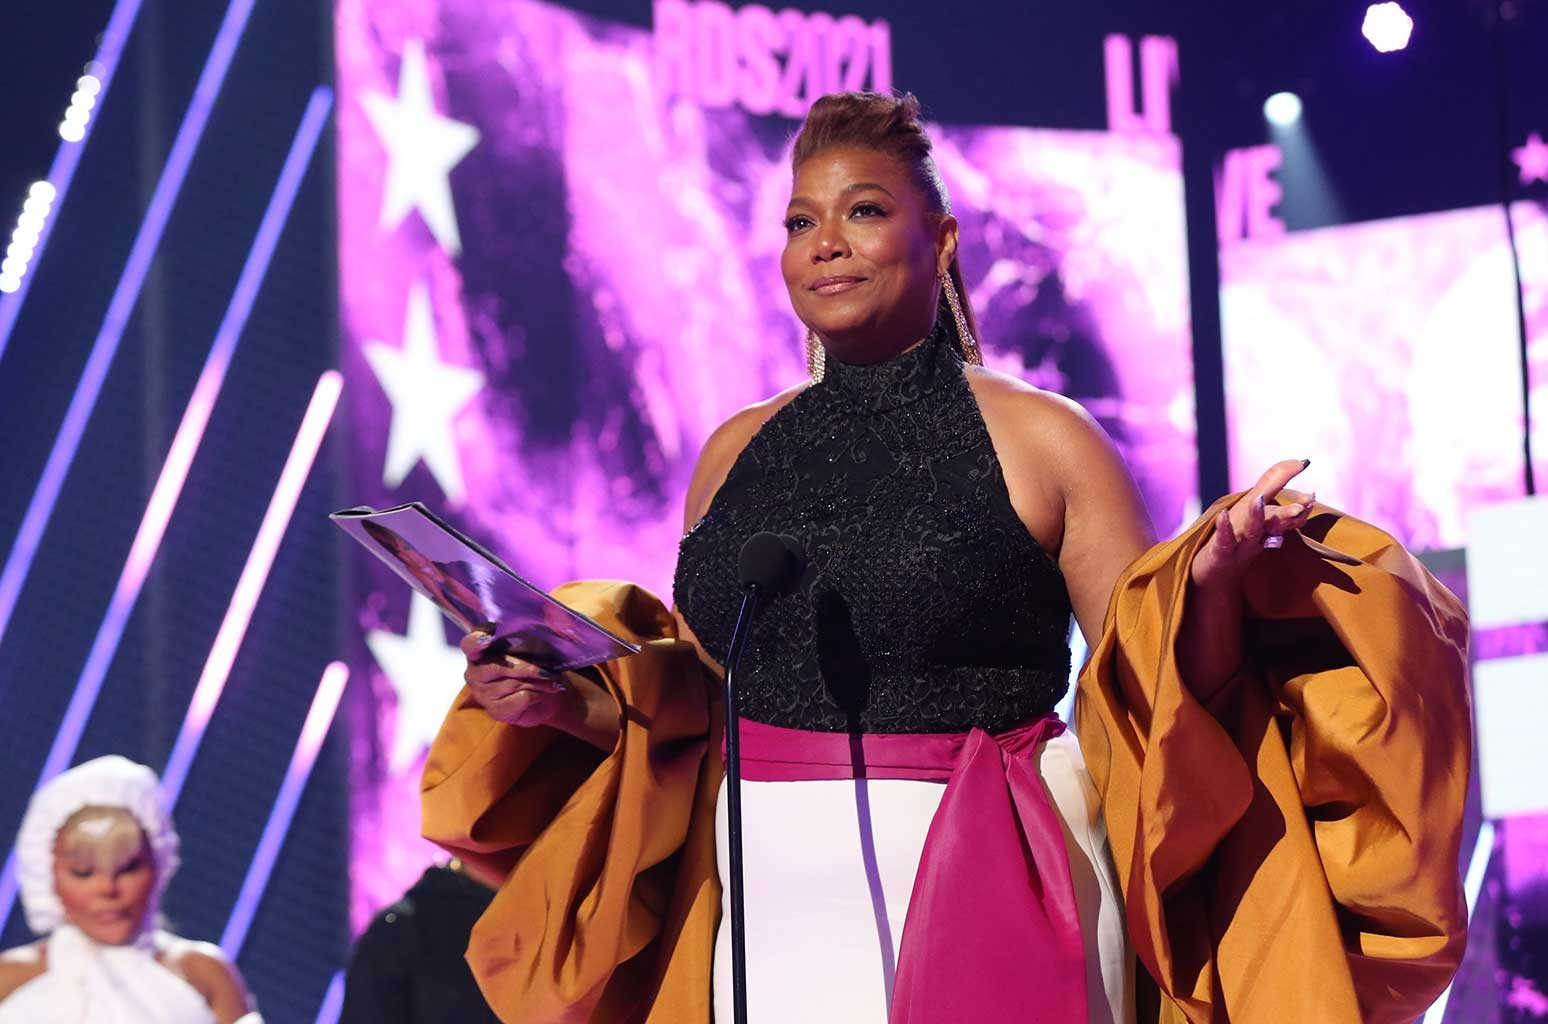 Queen Latifah Accepts Lifetime Achievement Award at 2021 BET Awards    Billboard